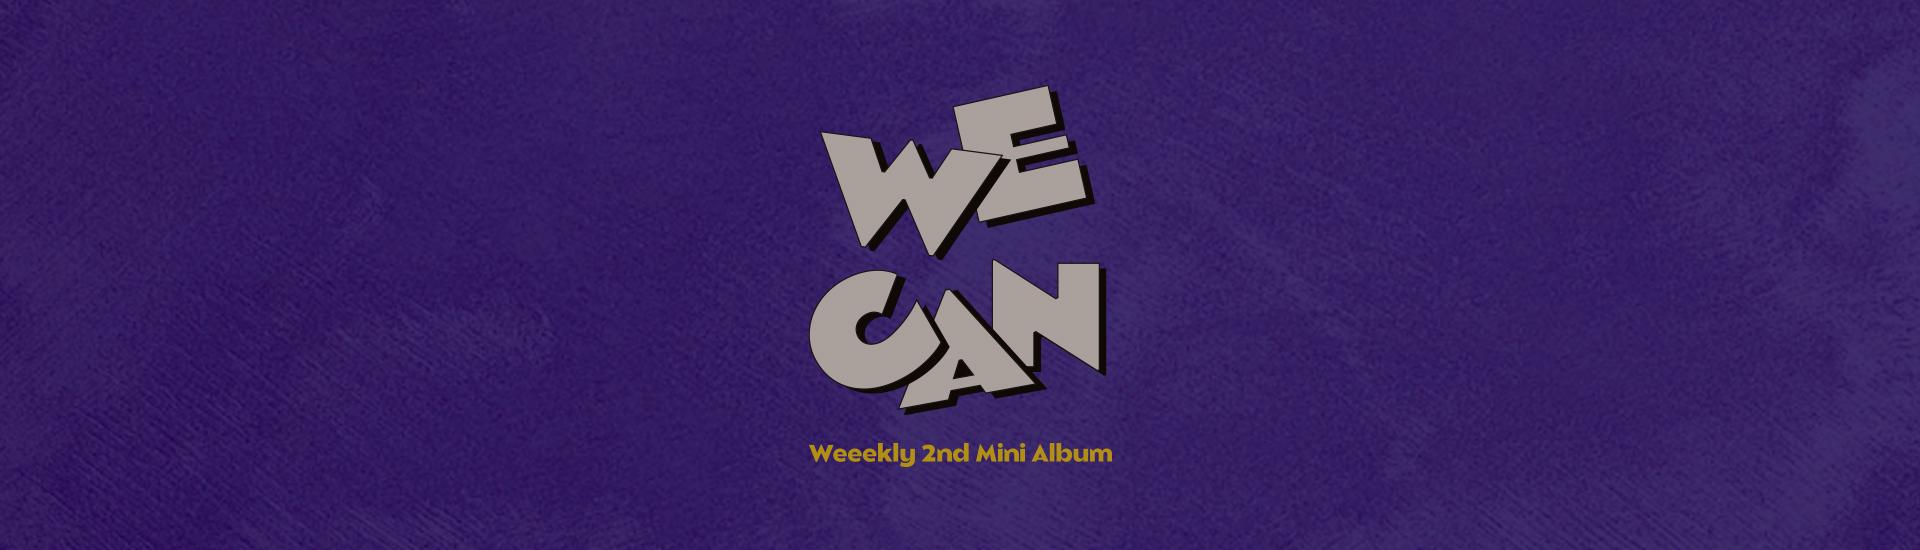 Weeekly - [We Can] Global Video Call